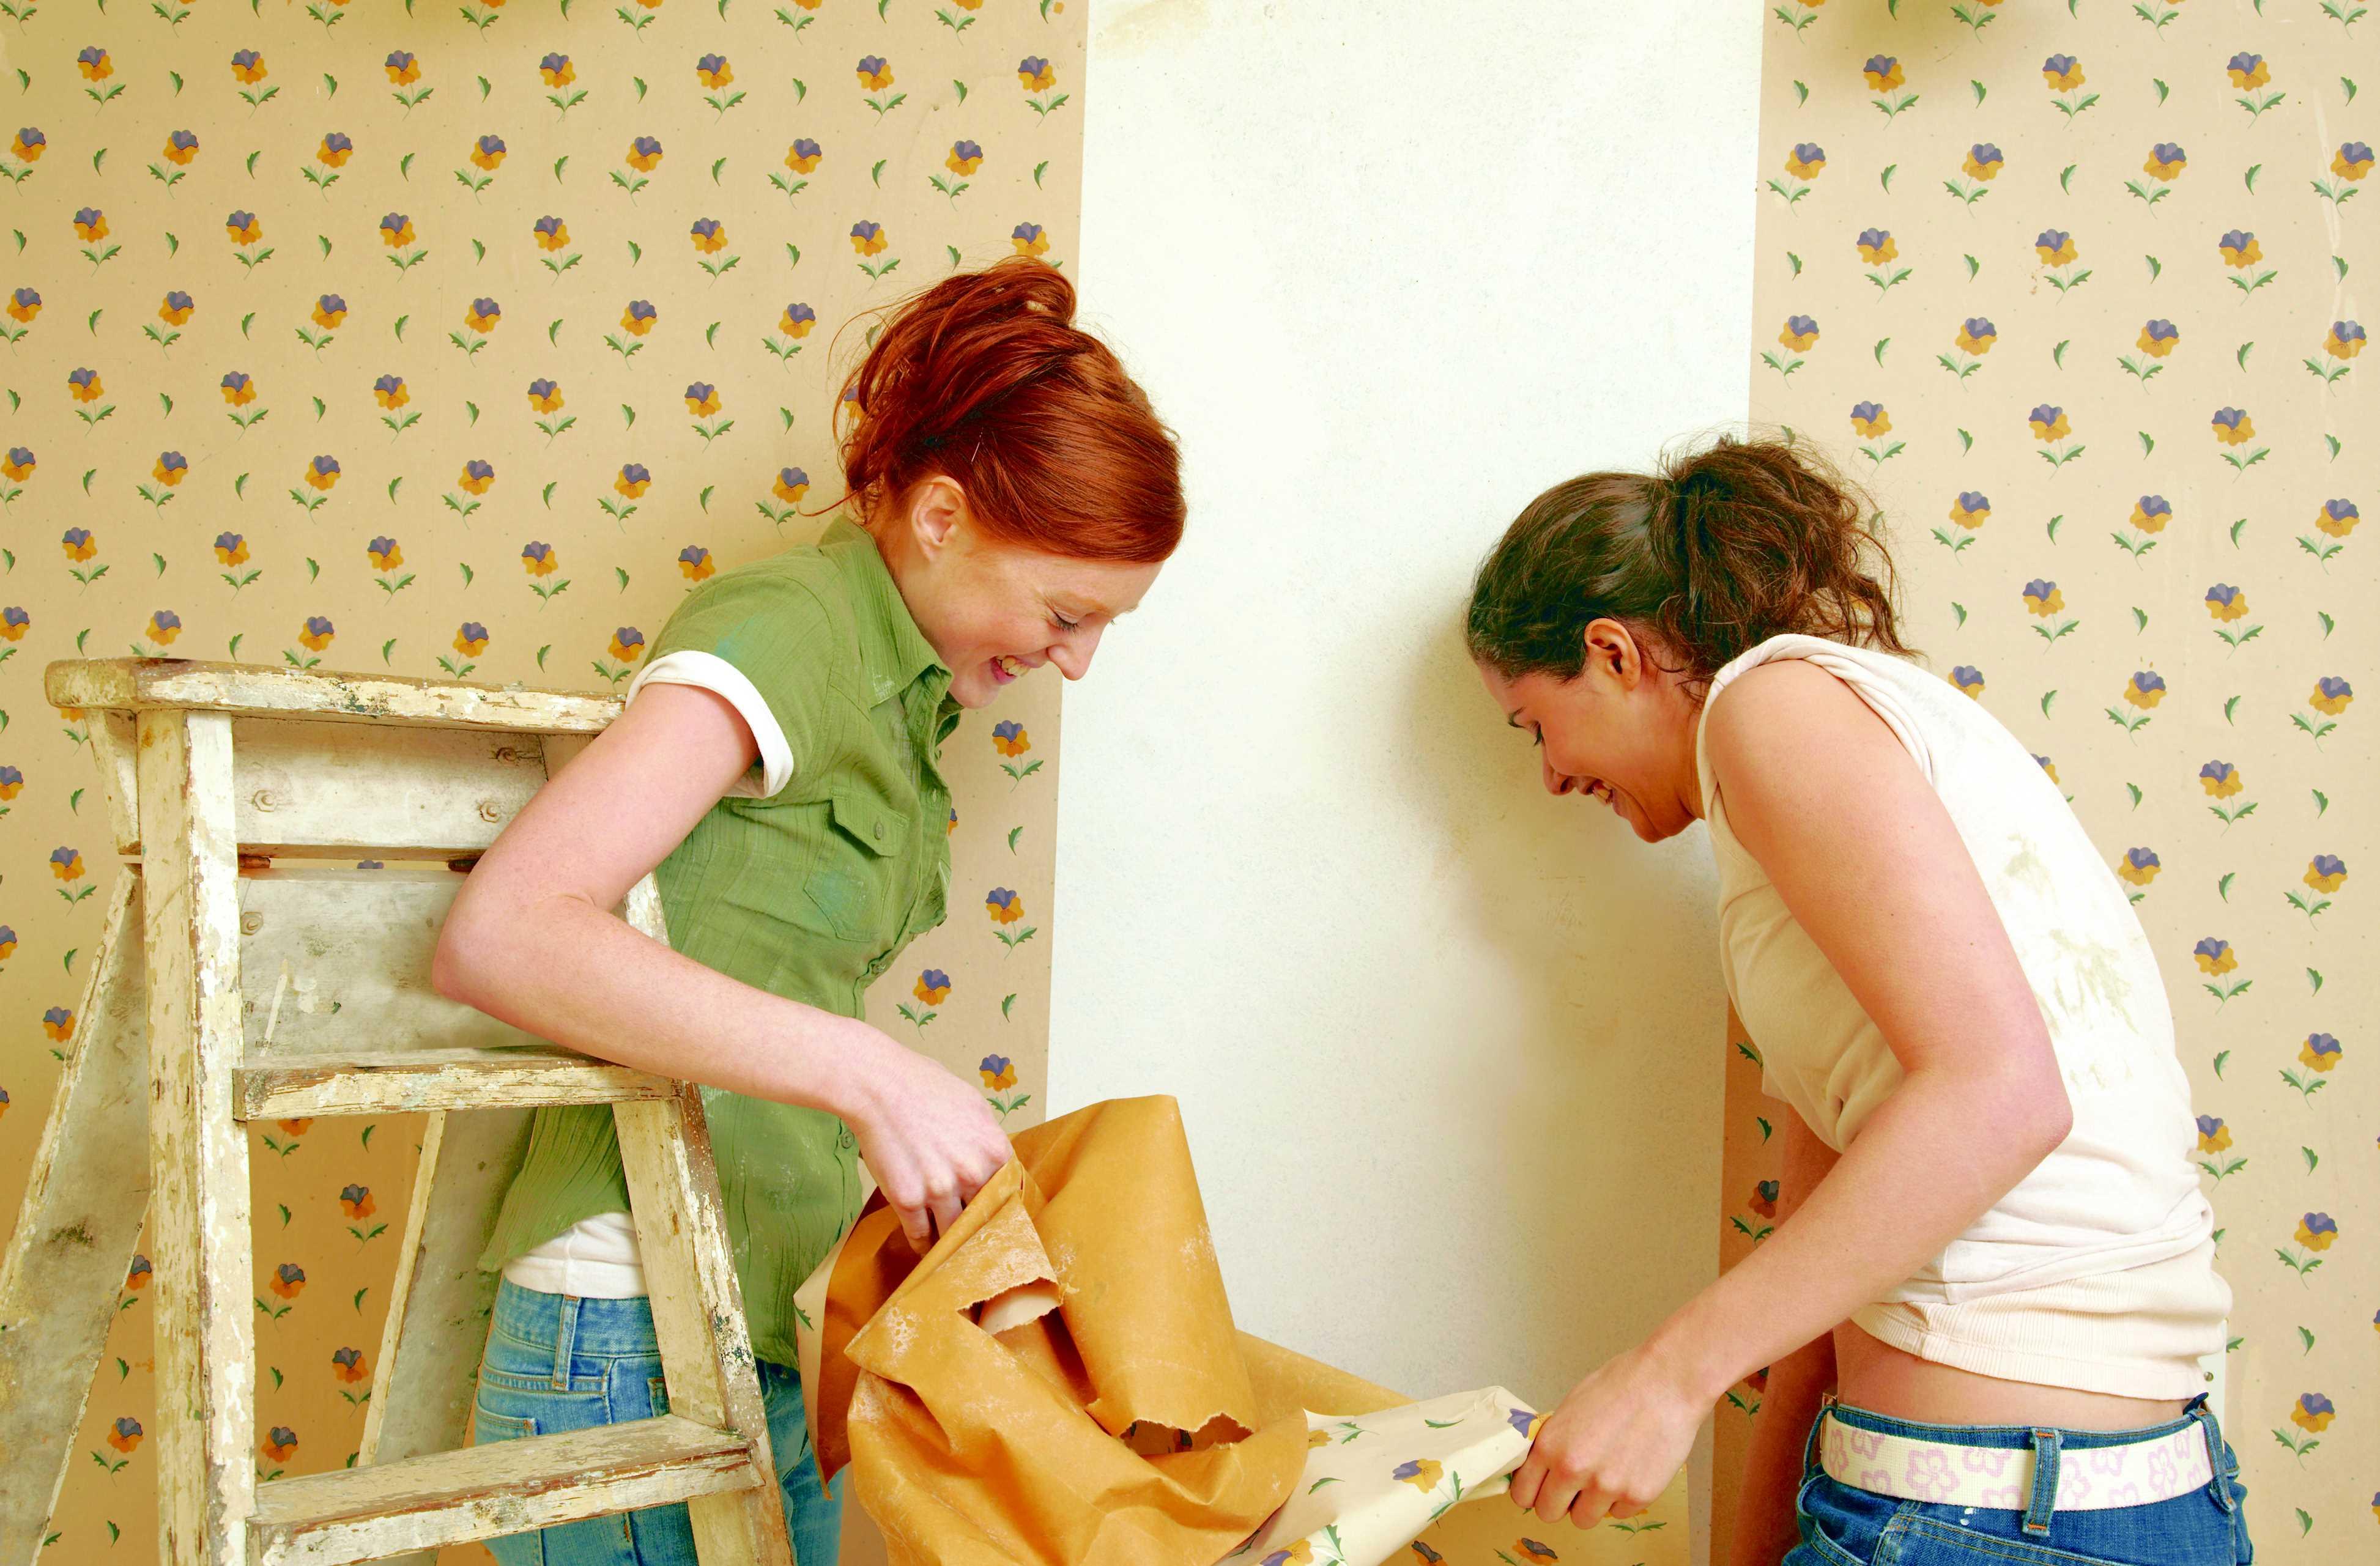 Wallpaper Removal as Easy as Peeling a Banana 3891x2561